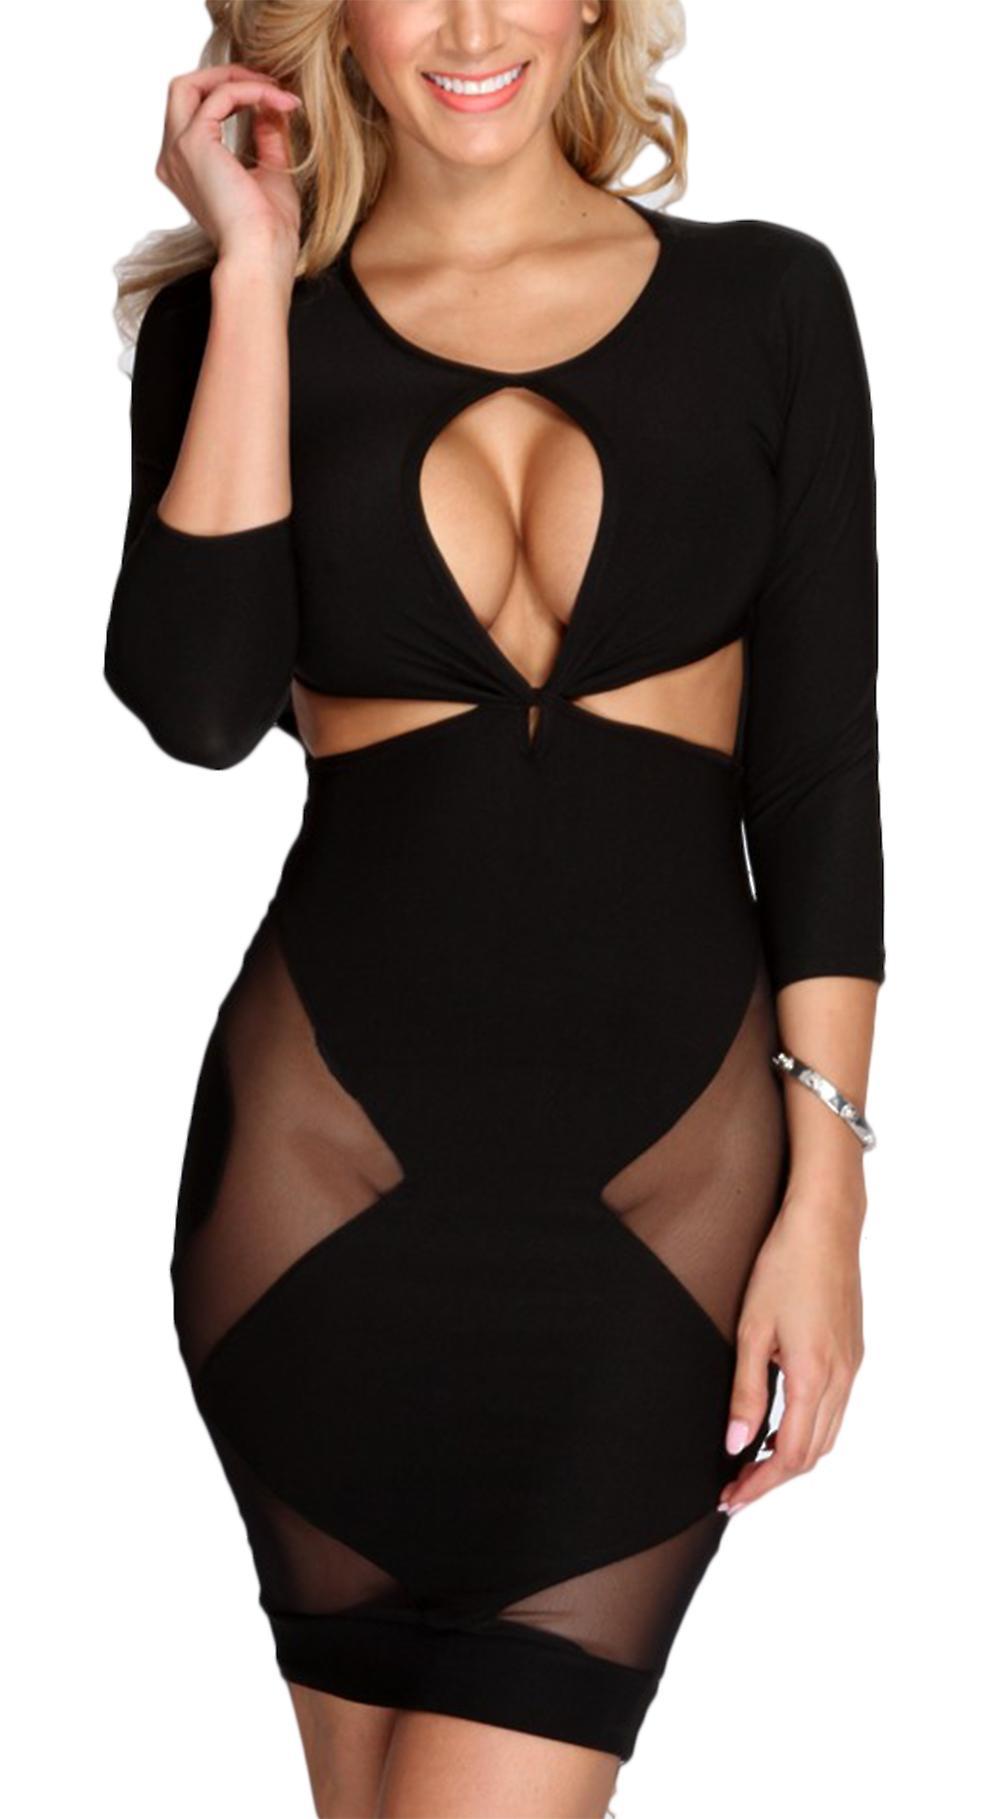 Waooh - Sexy Dress Ajourée Mailix